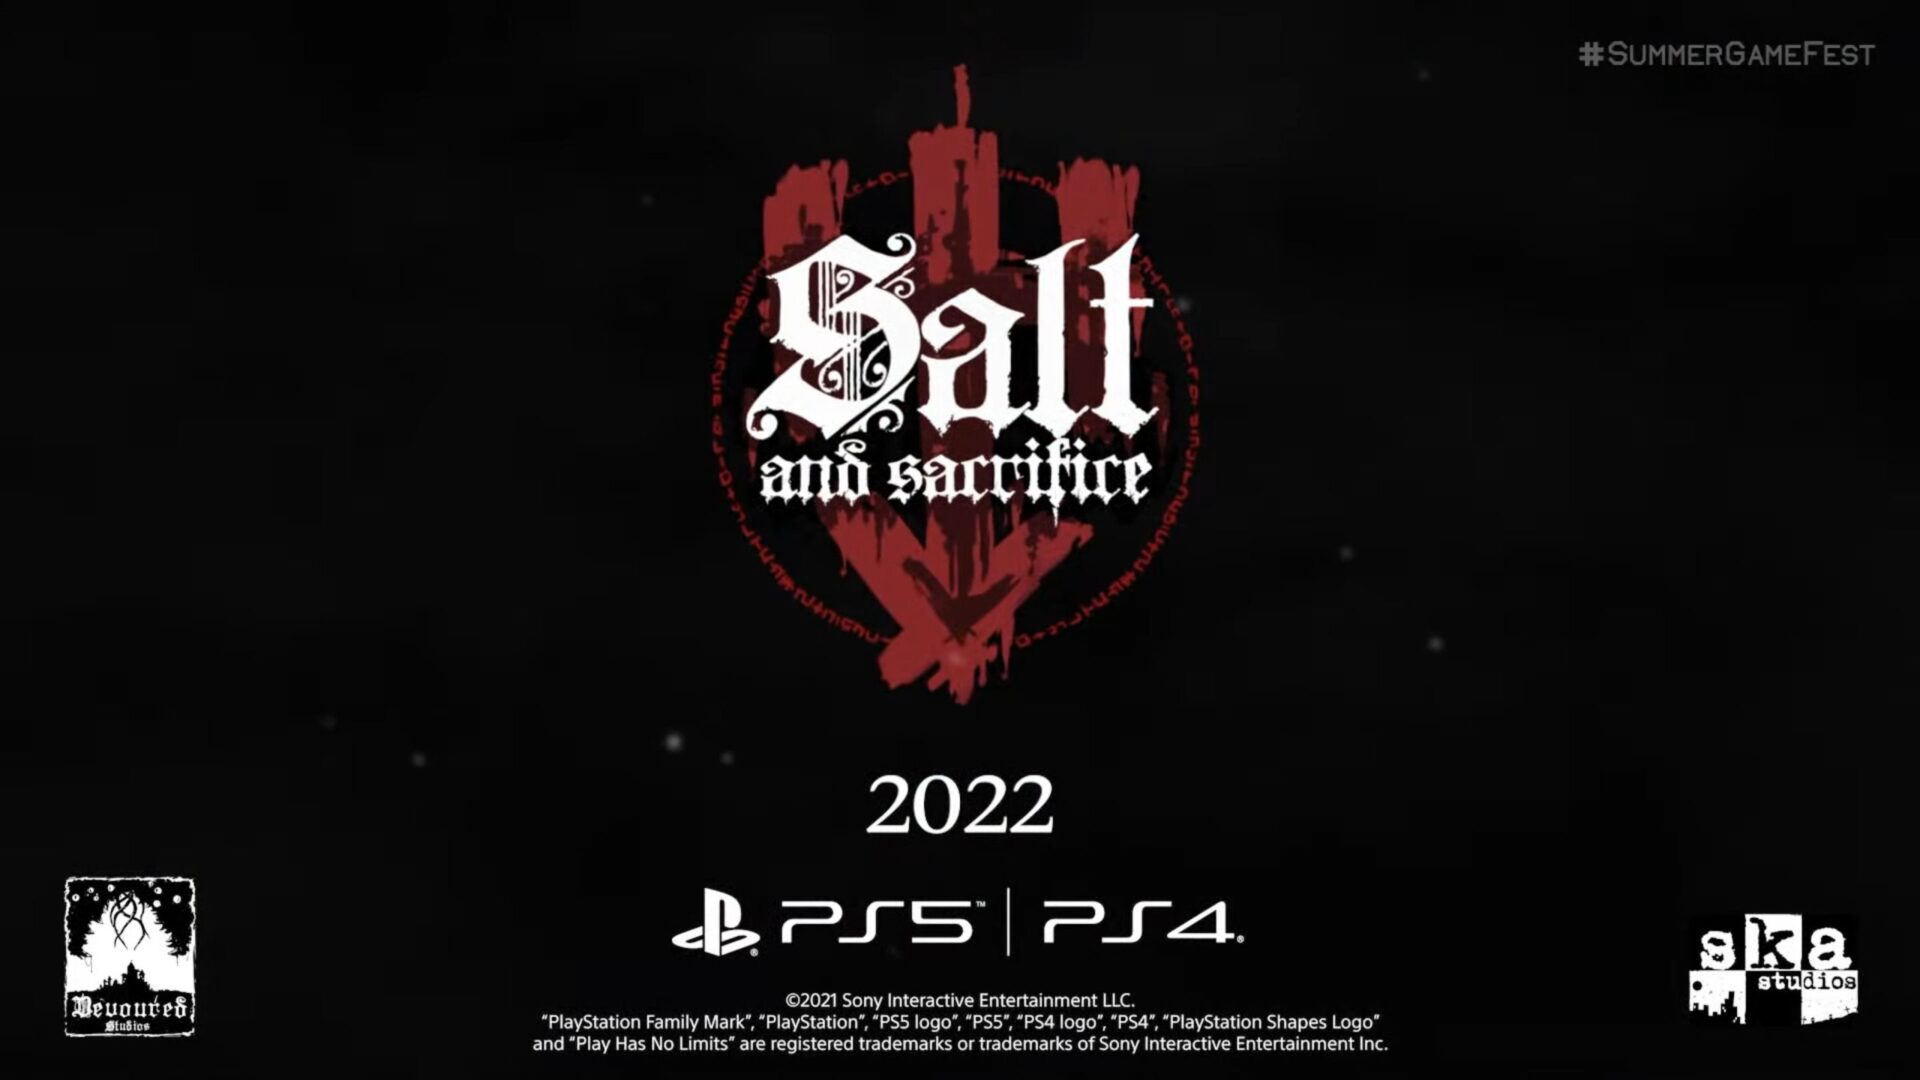 Salt and Sacrfifice